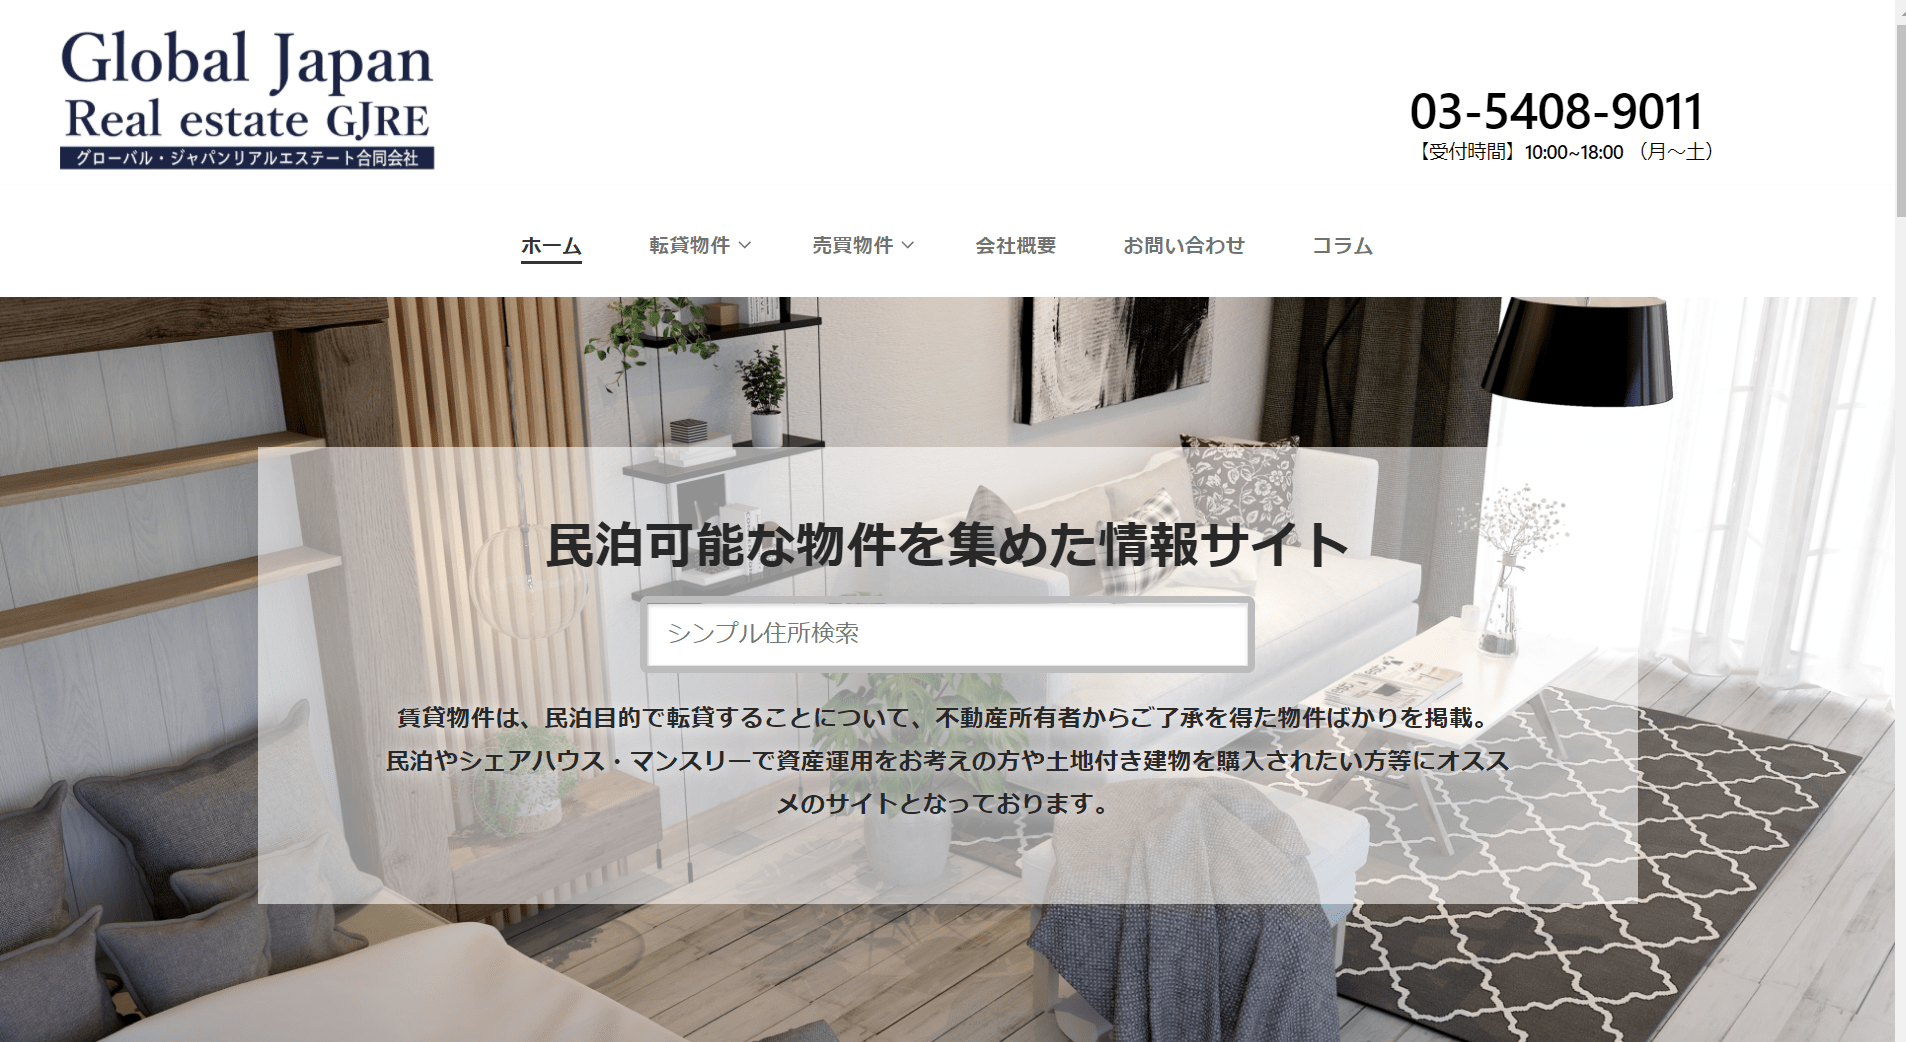 Global Japan Real estate GjRE